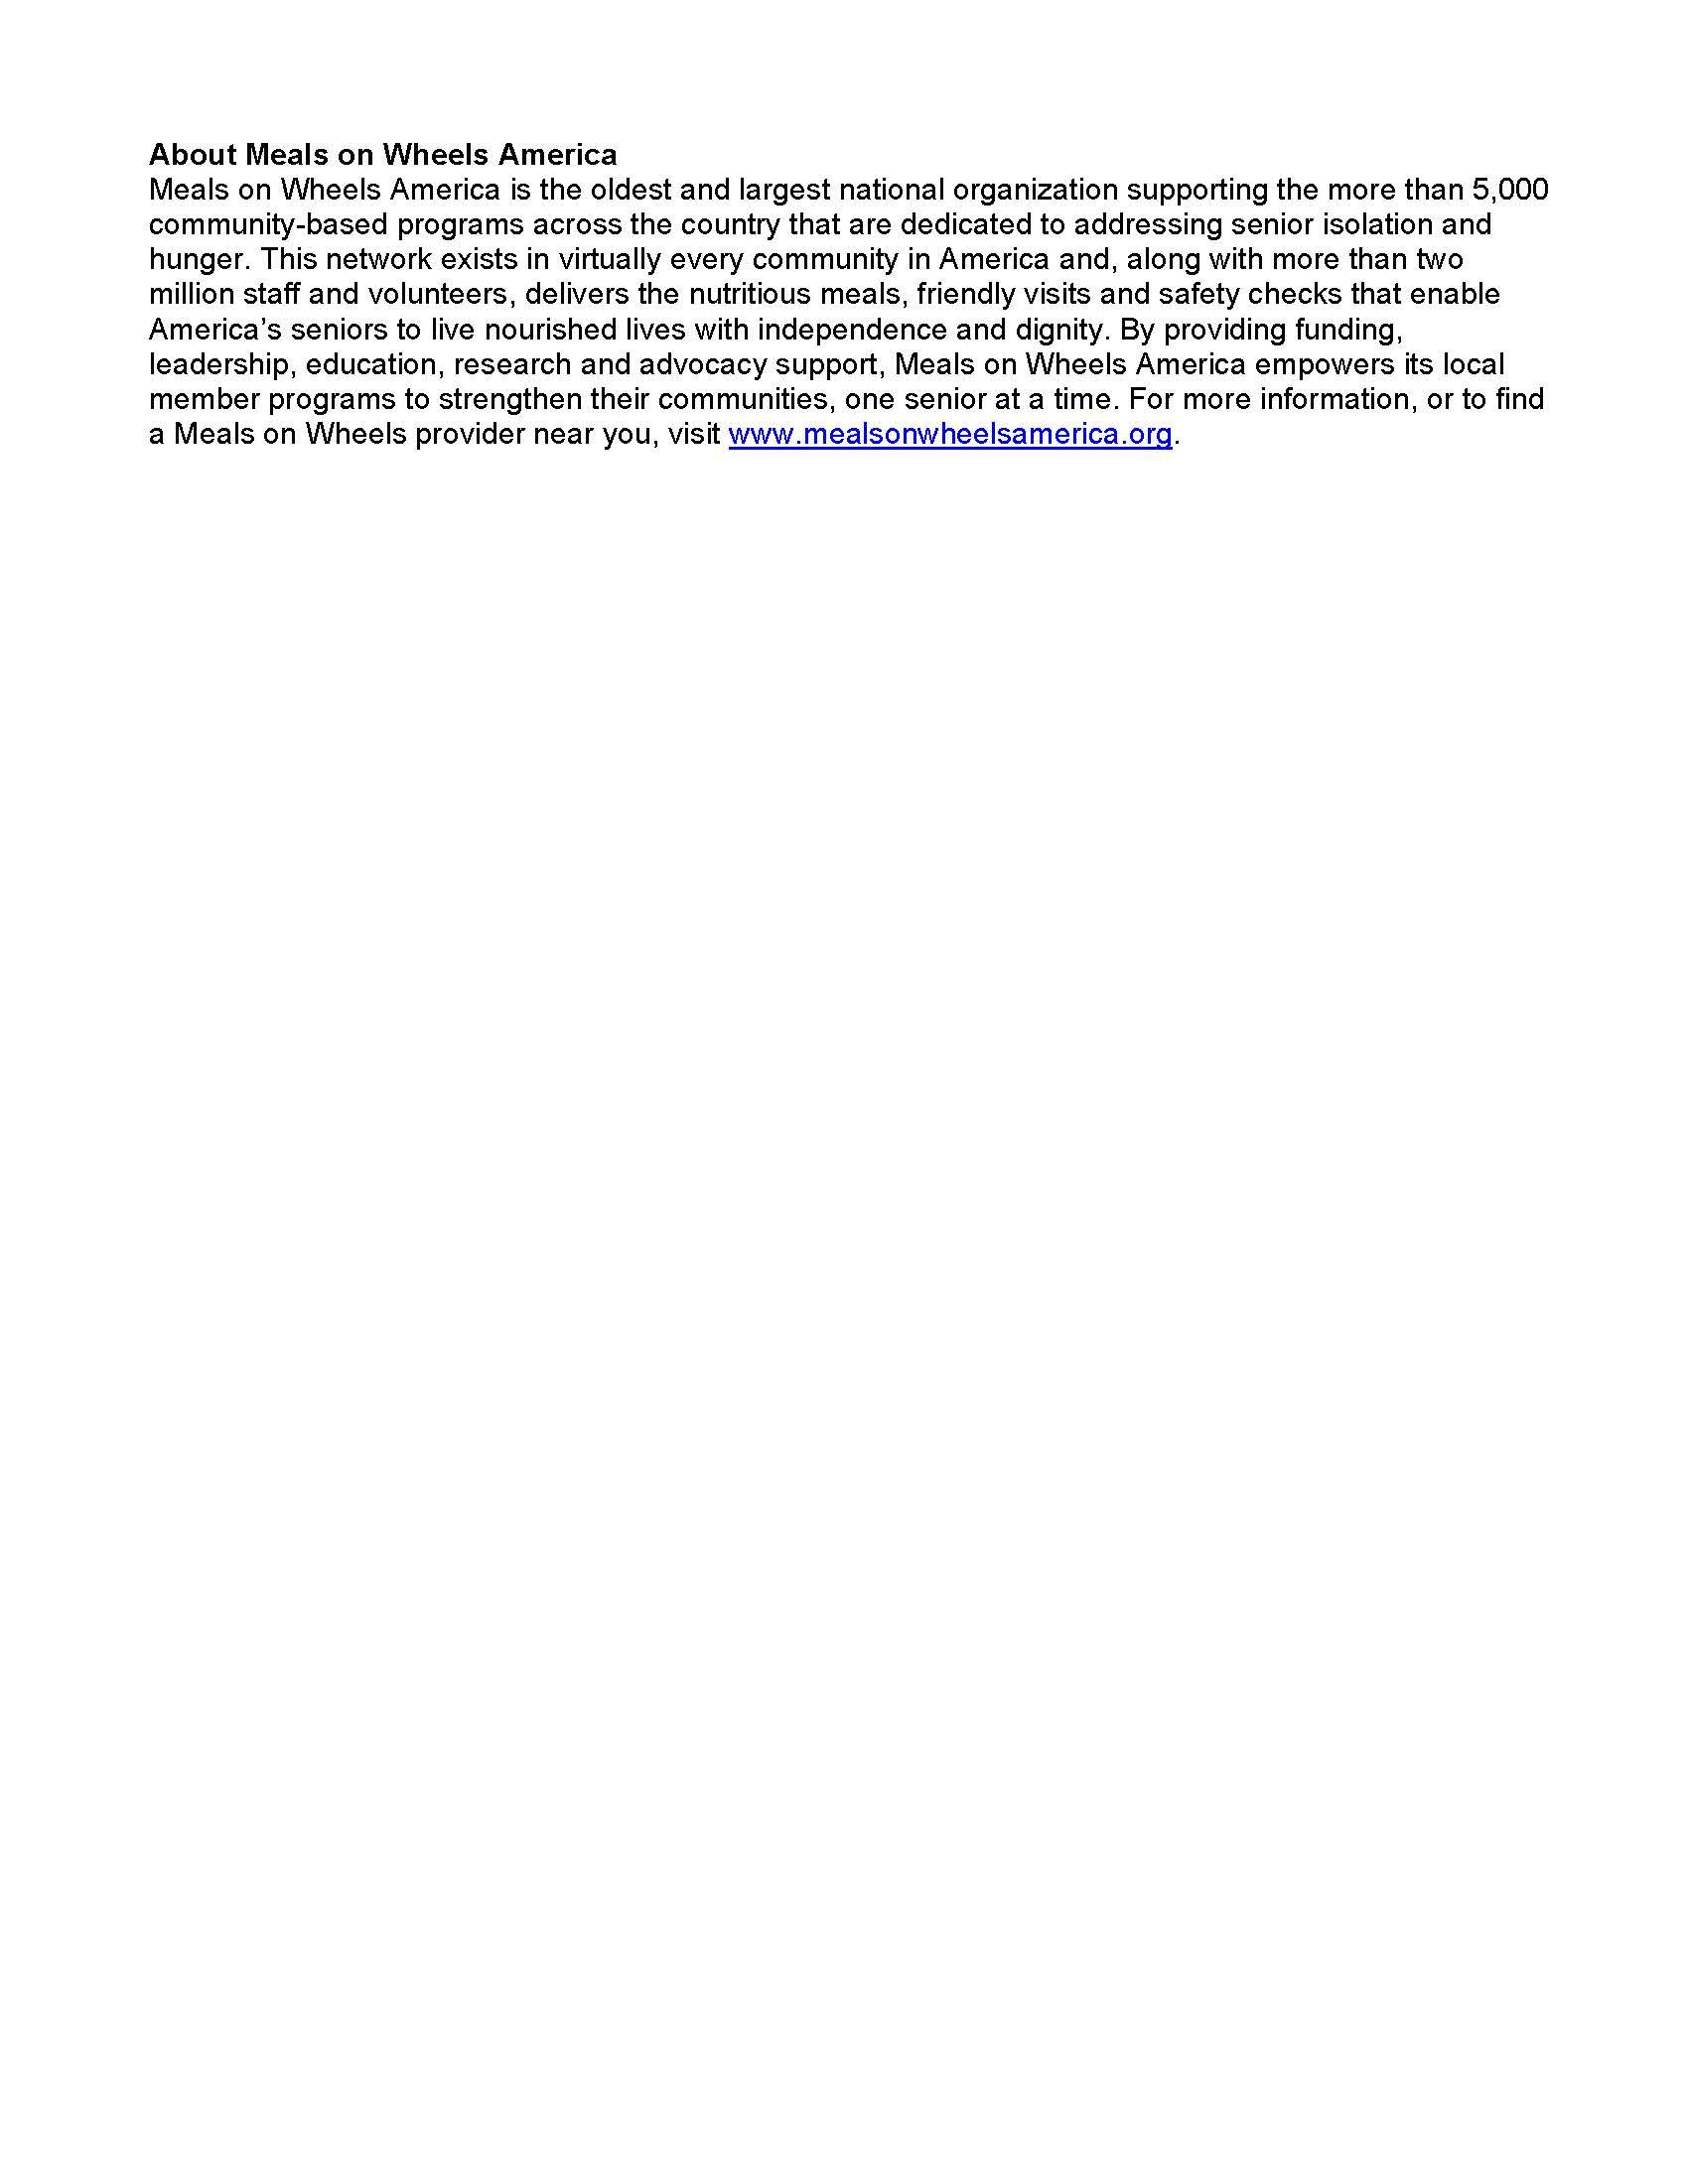 Grant Award PSA Announcement_Page_2